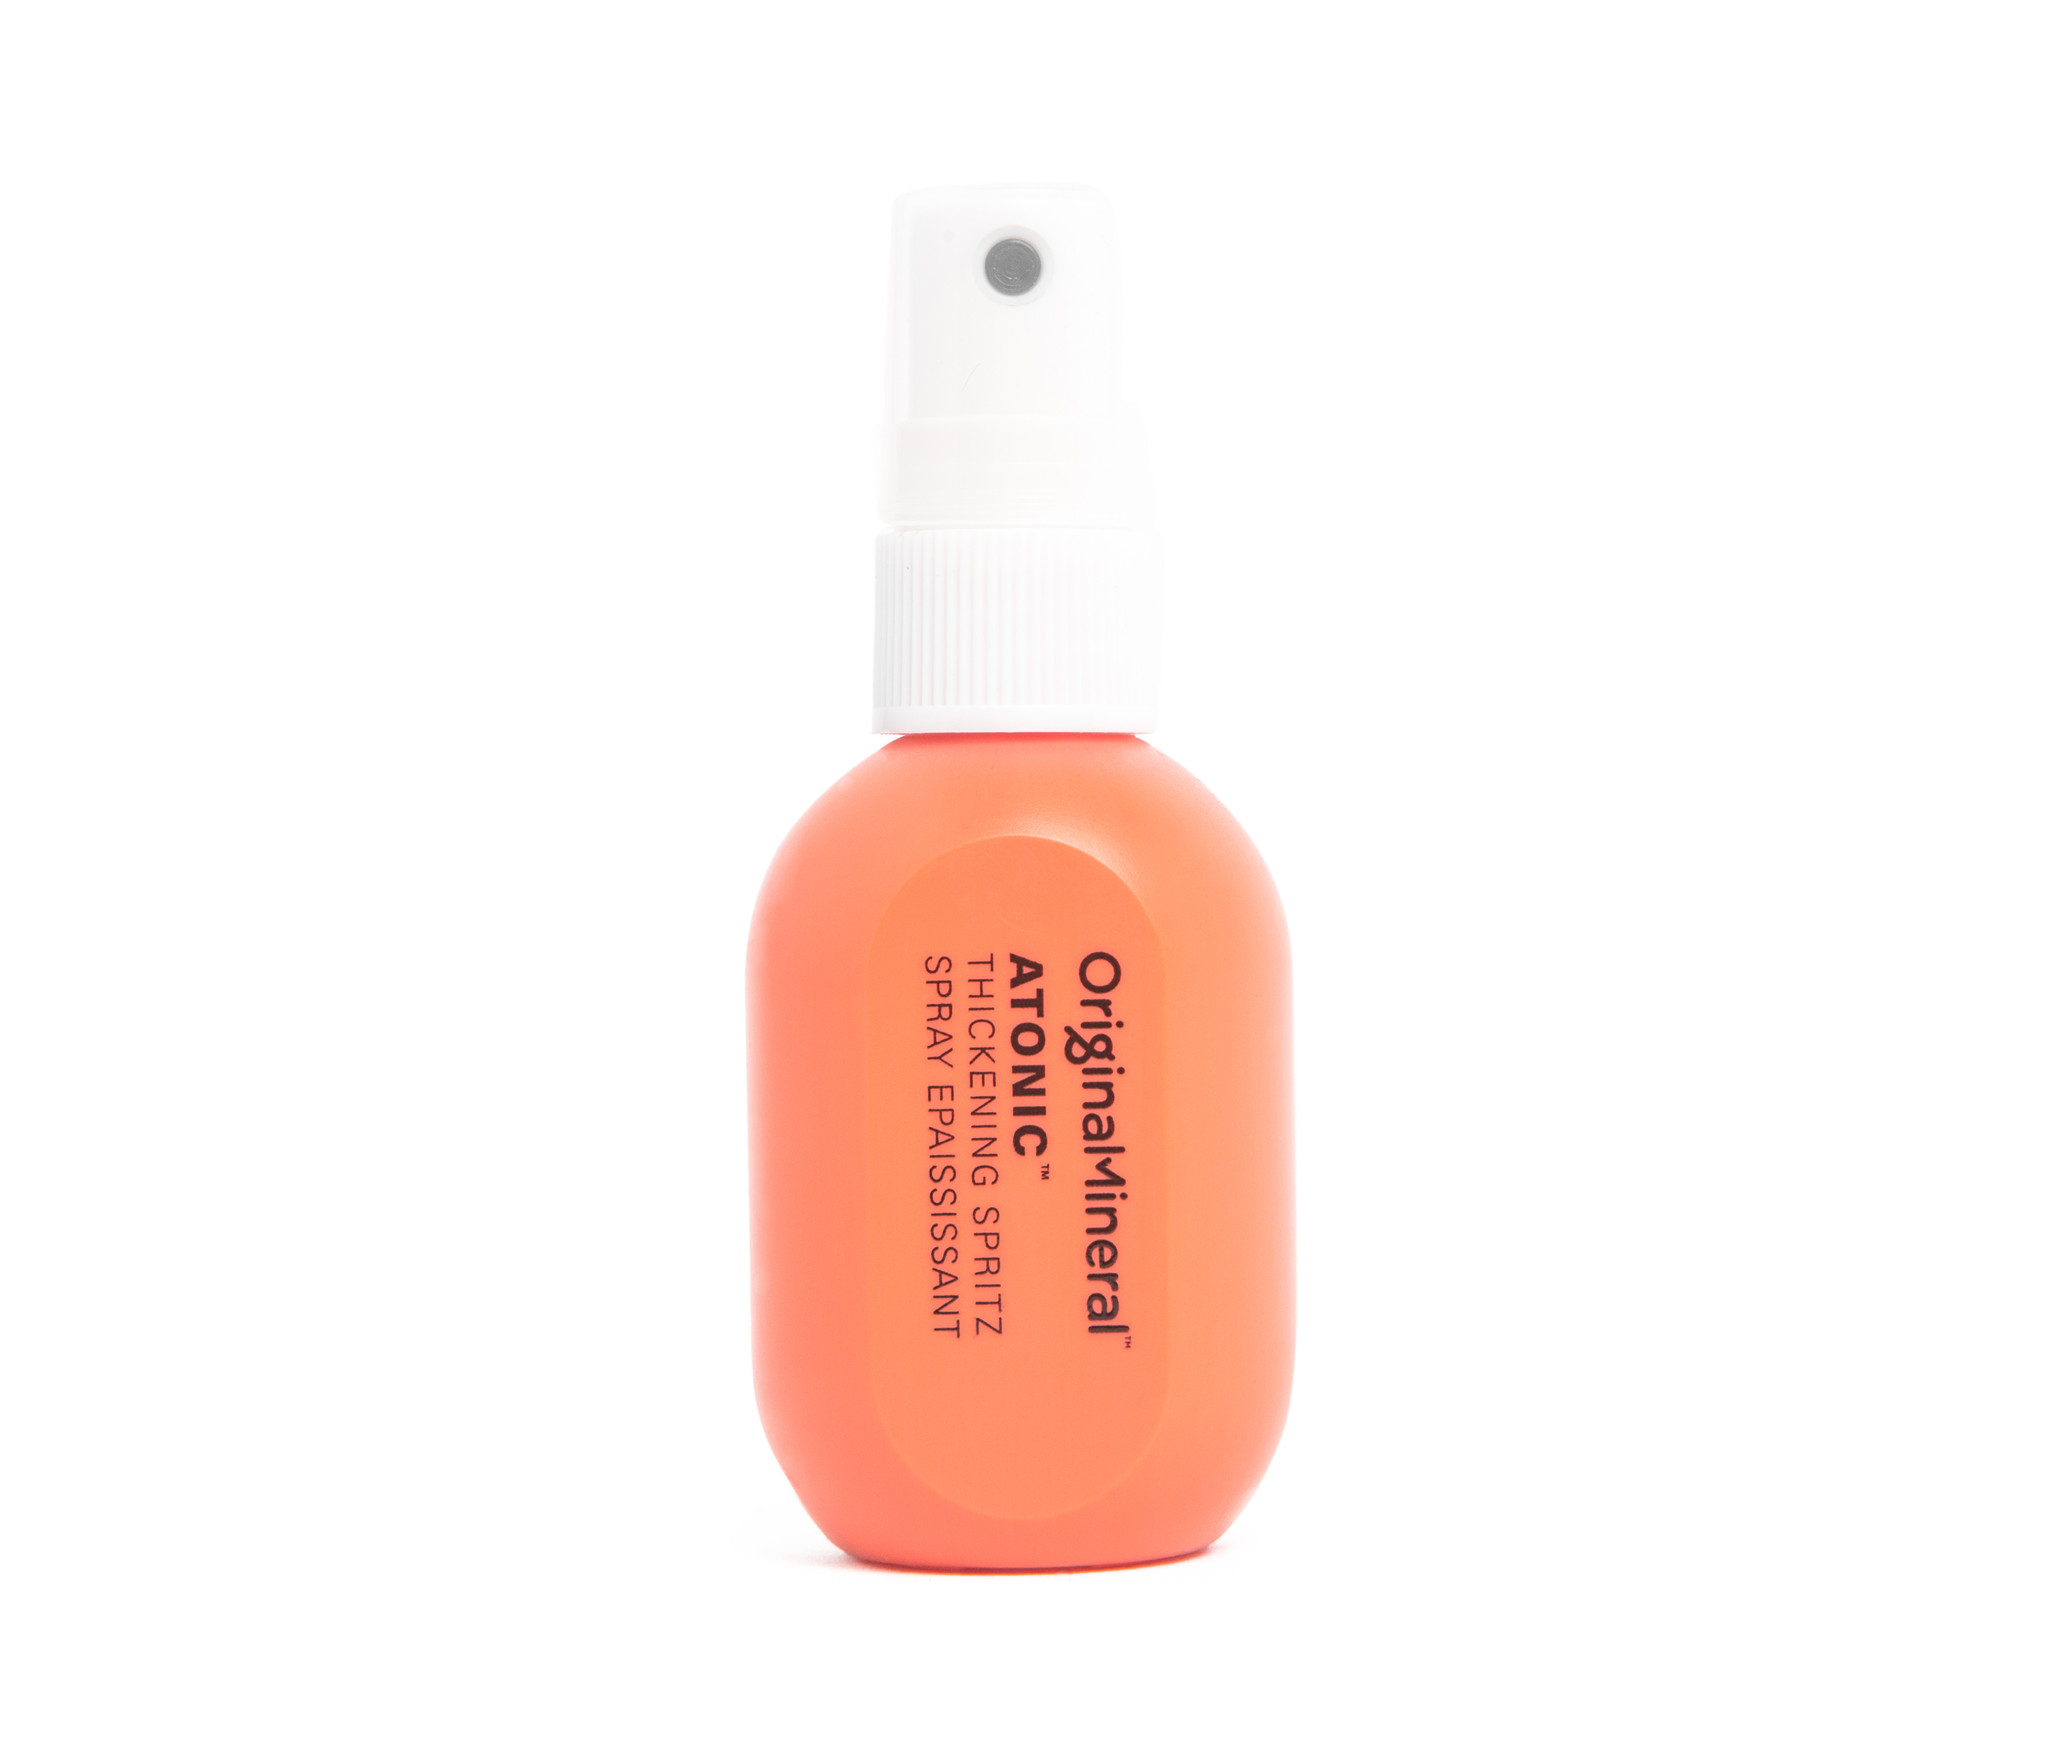 O&M - Original Mineral O&M Atonic Thickening Spritz - Spray épaississant  - 50ml